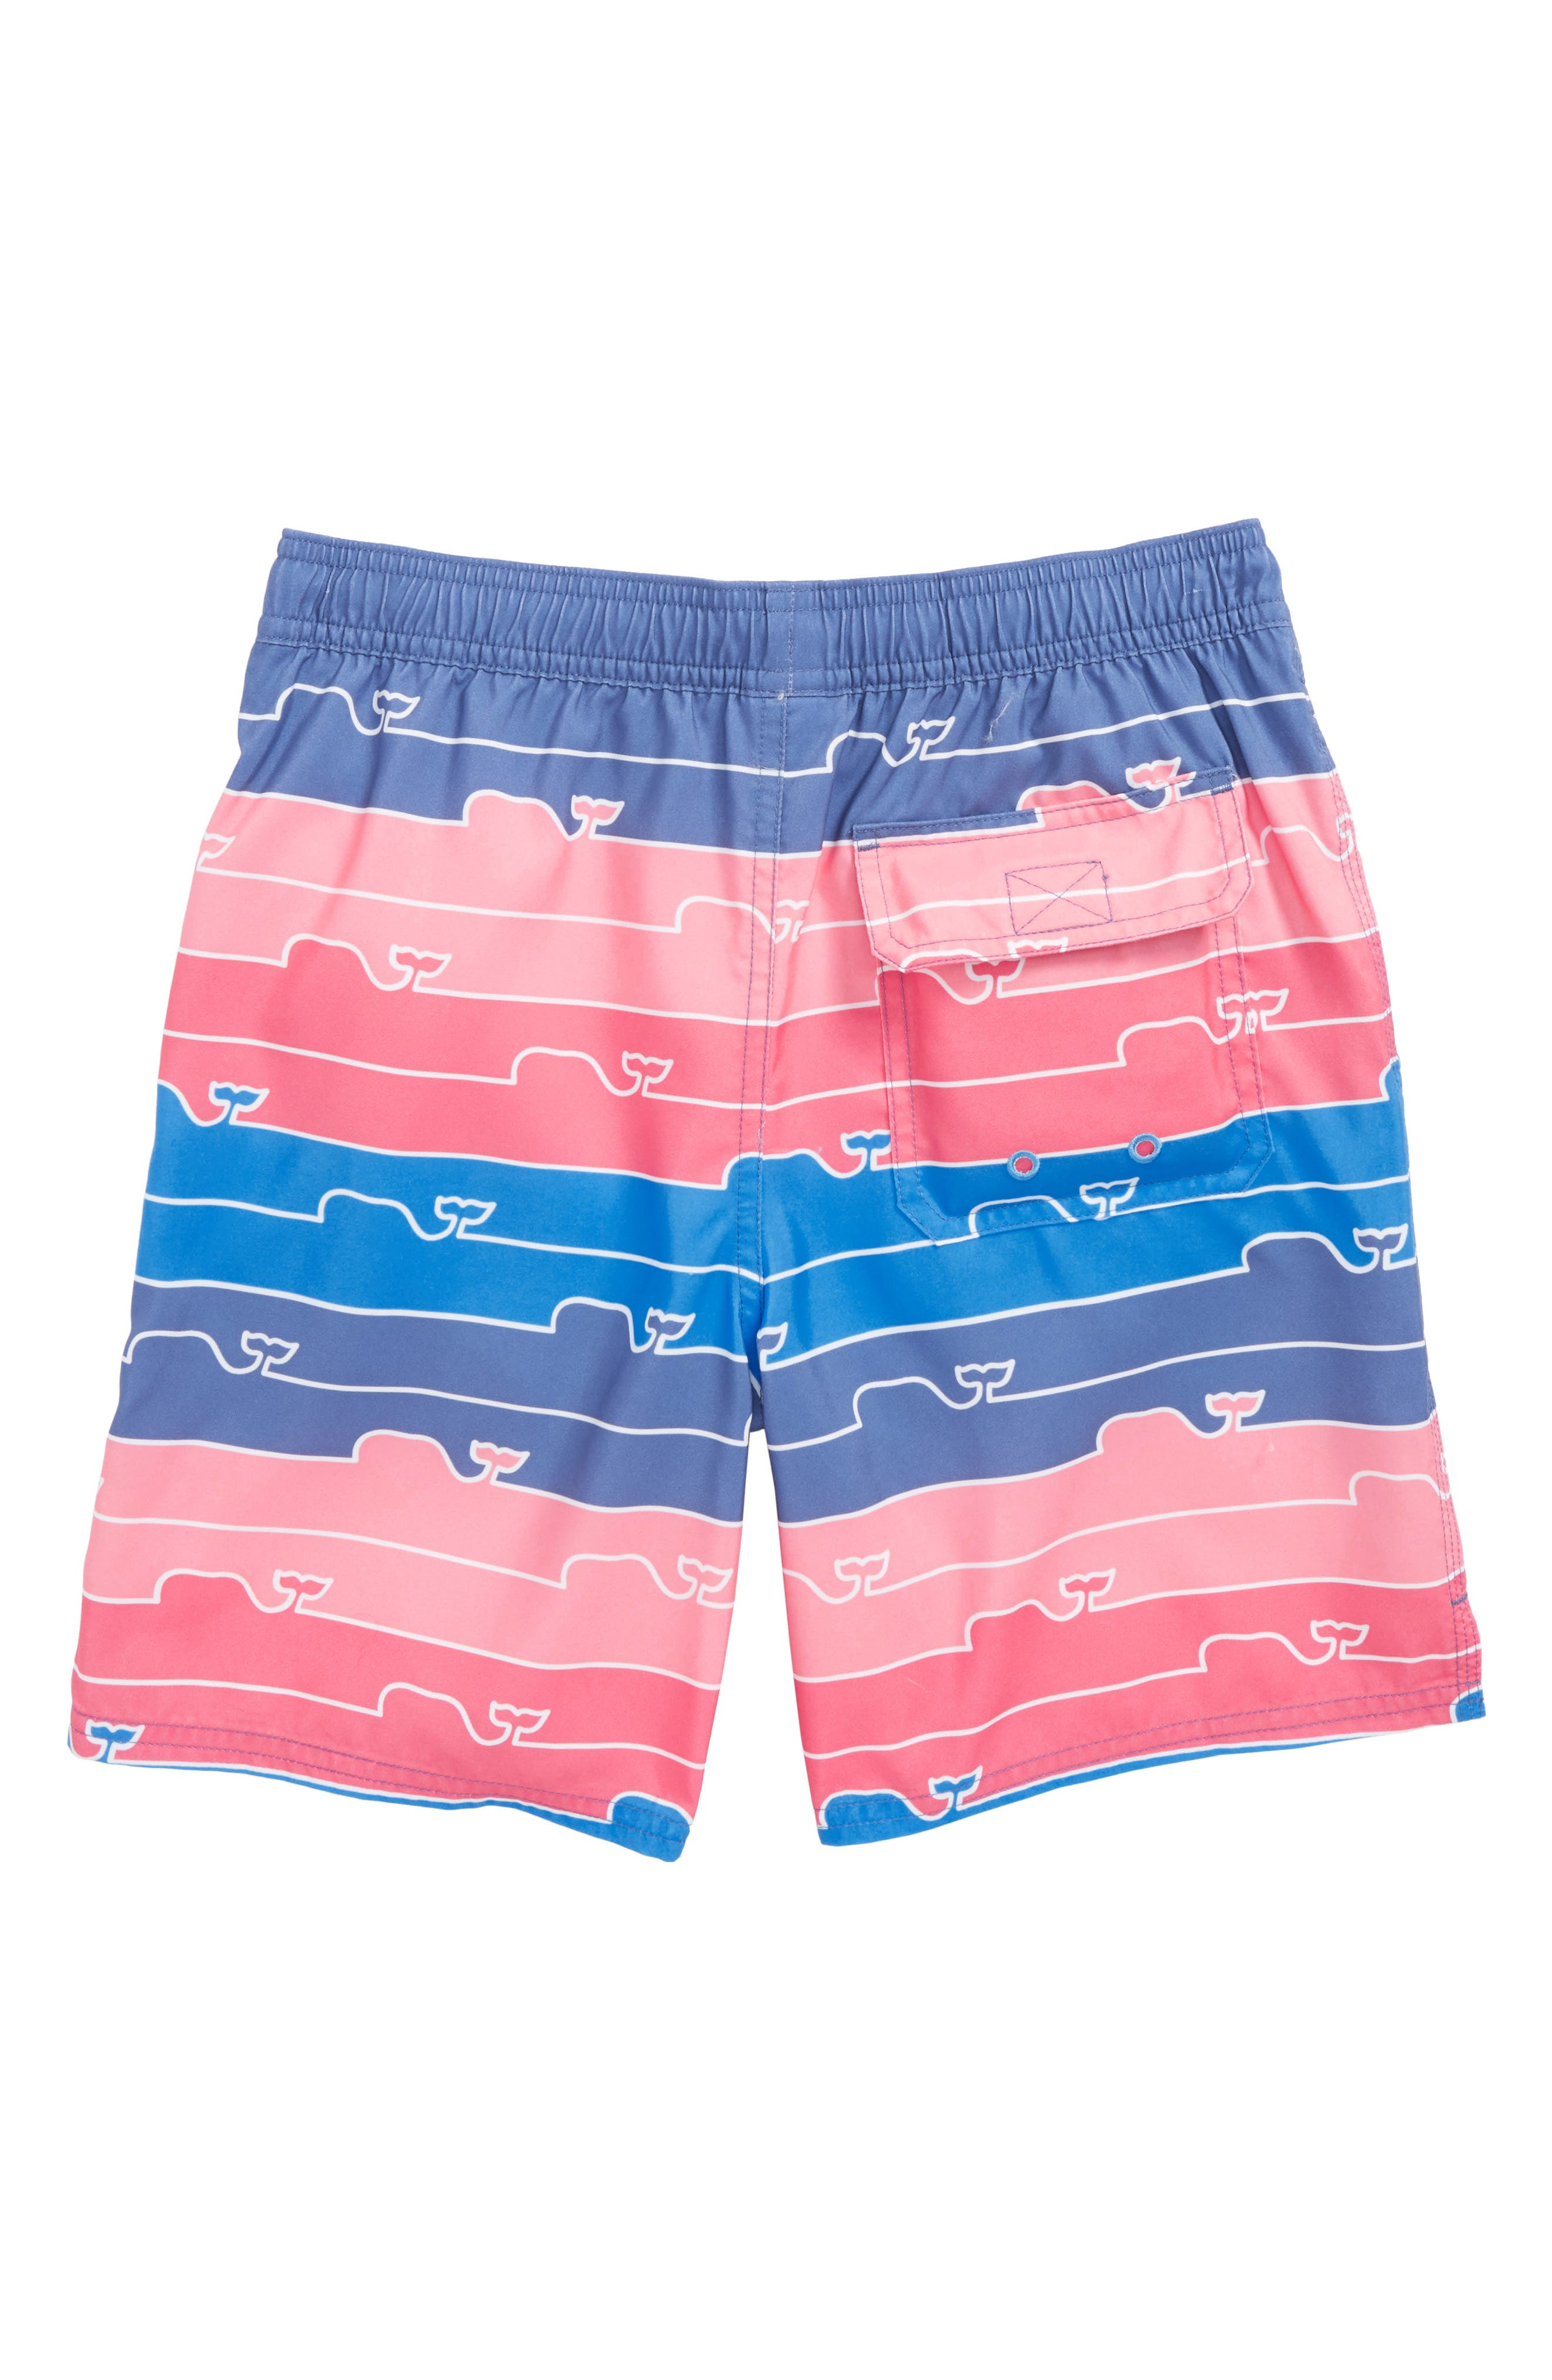 Chappy Whale Line Swim Trunks,                             Alternate thumbnail 2, color,                             461